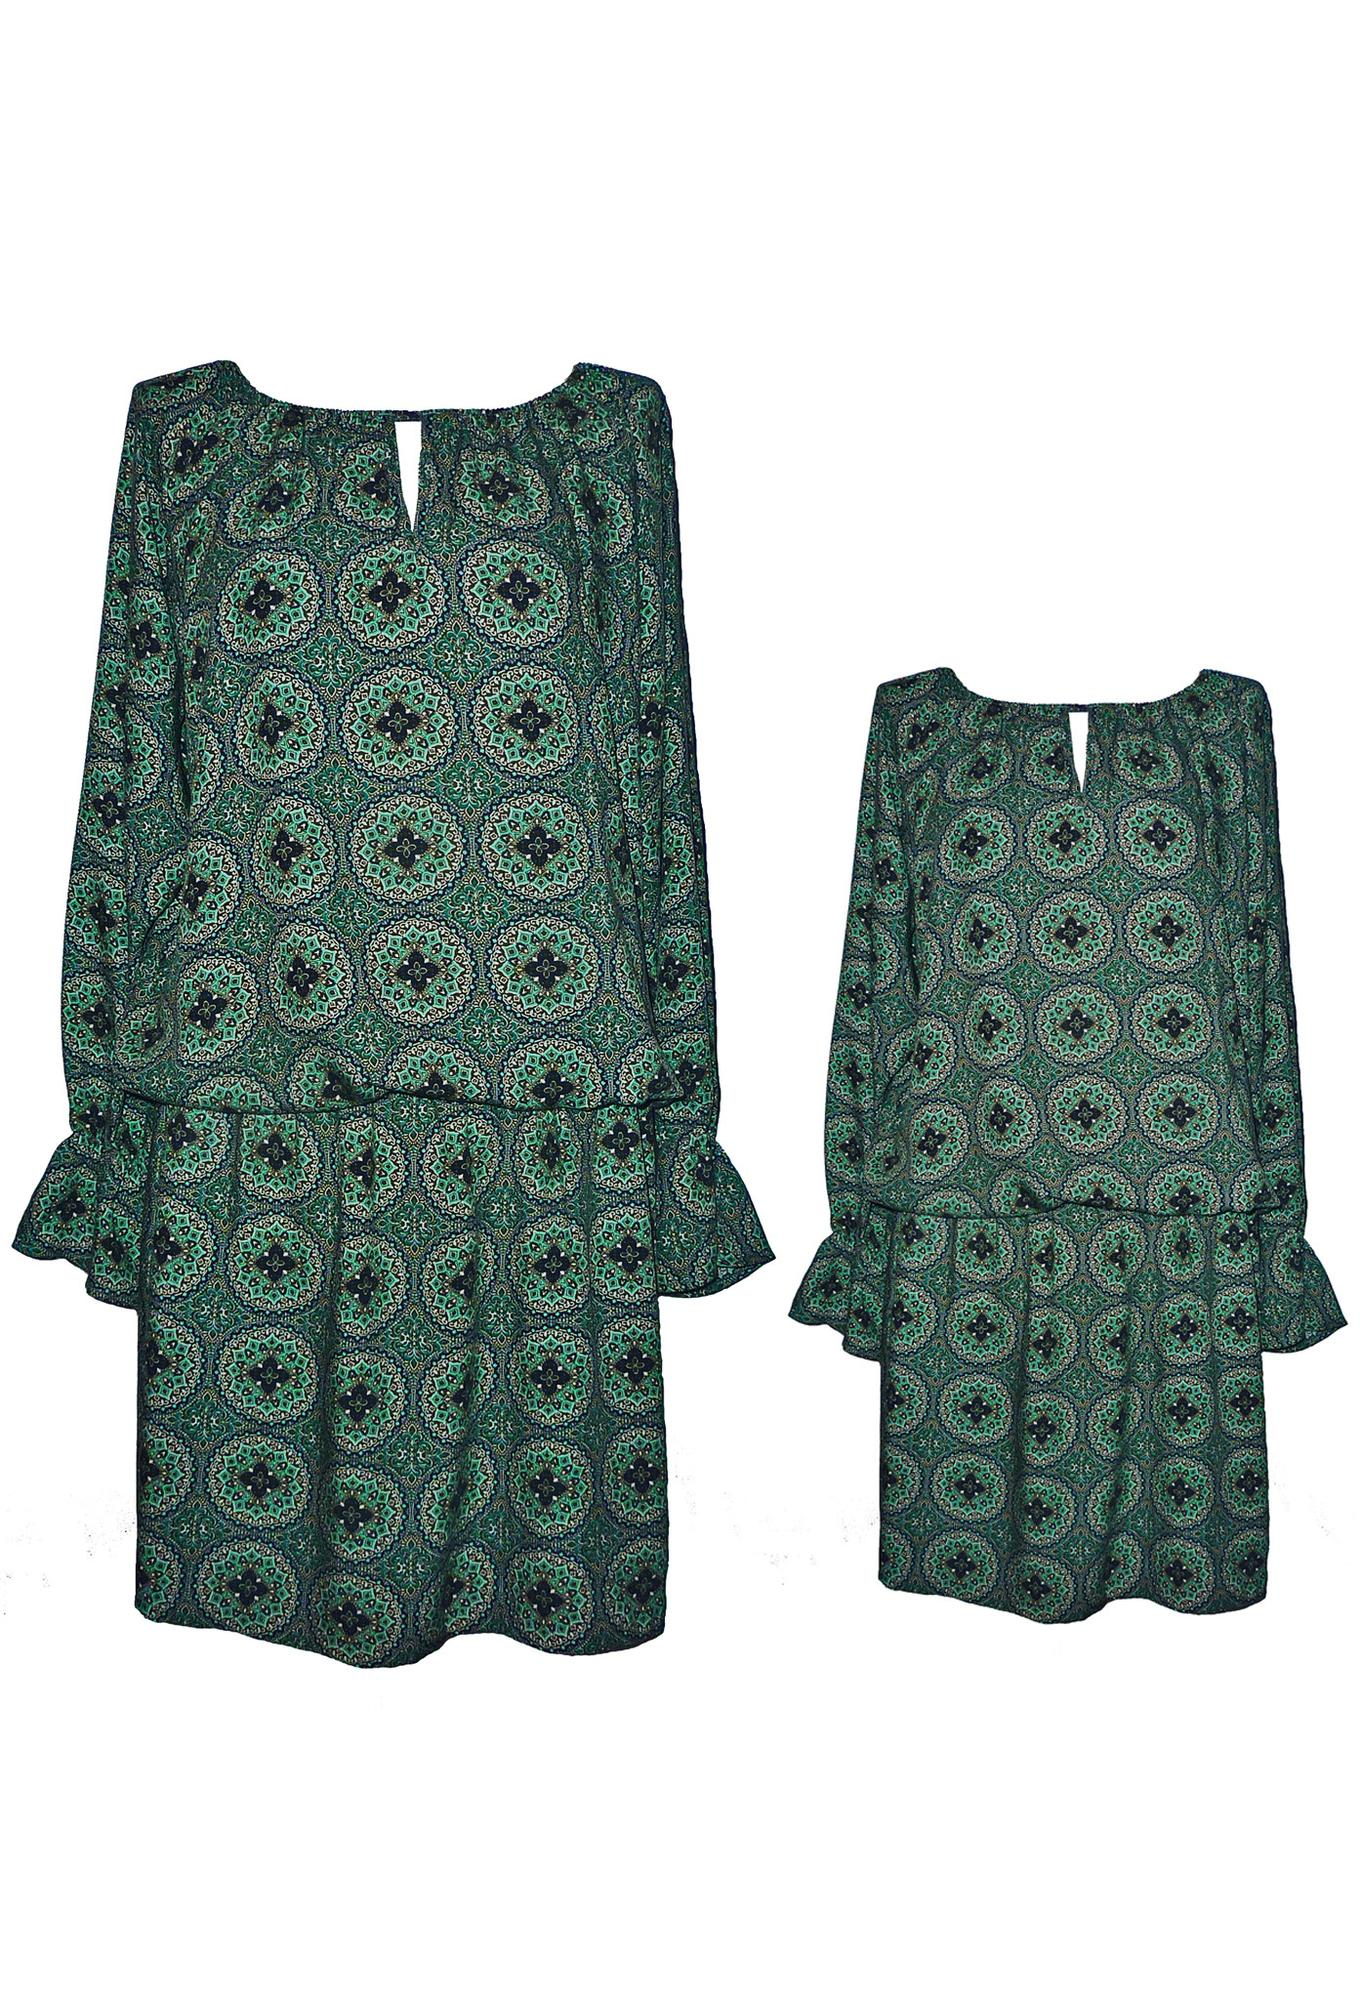 ZESTAW 2 Sukienki Boho Nova Green - The Same